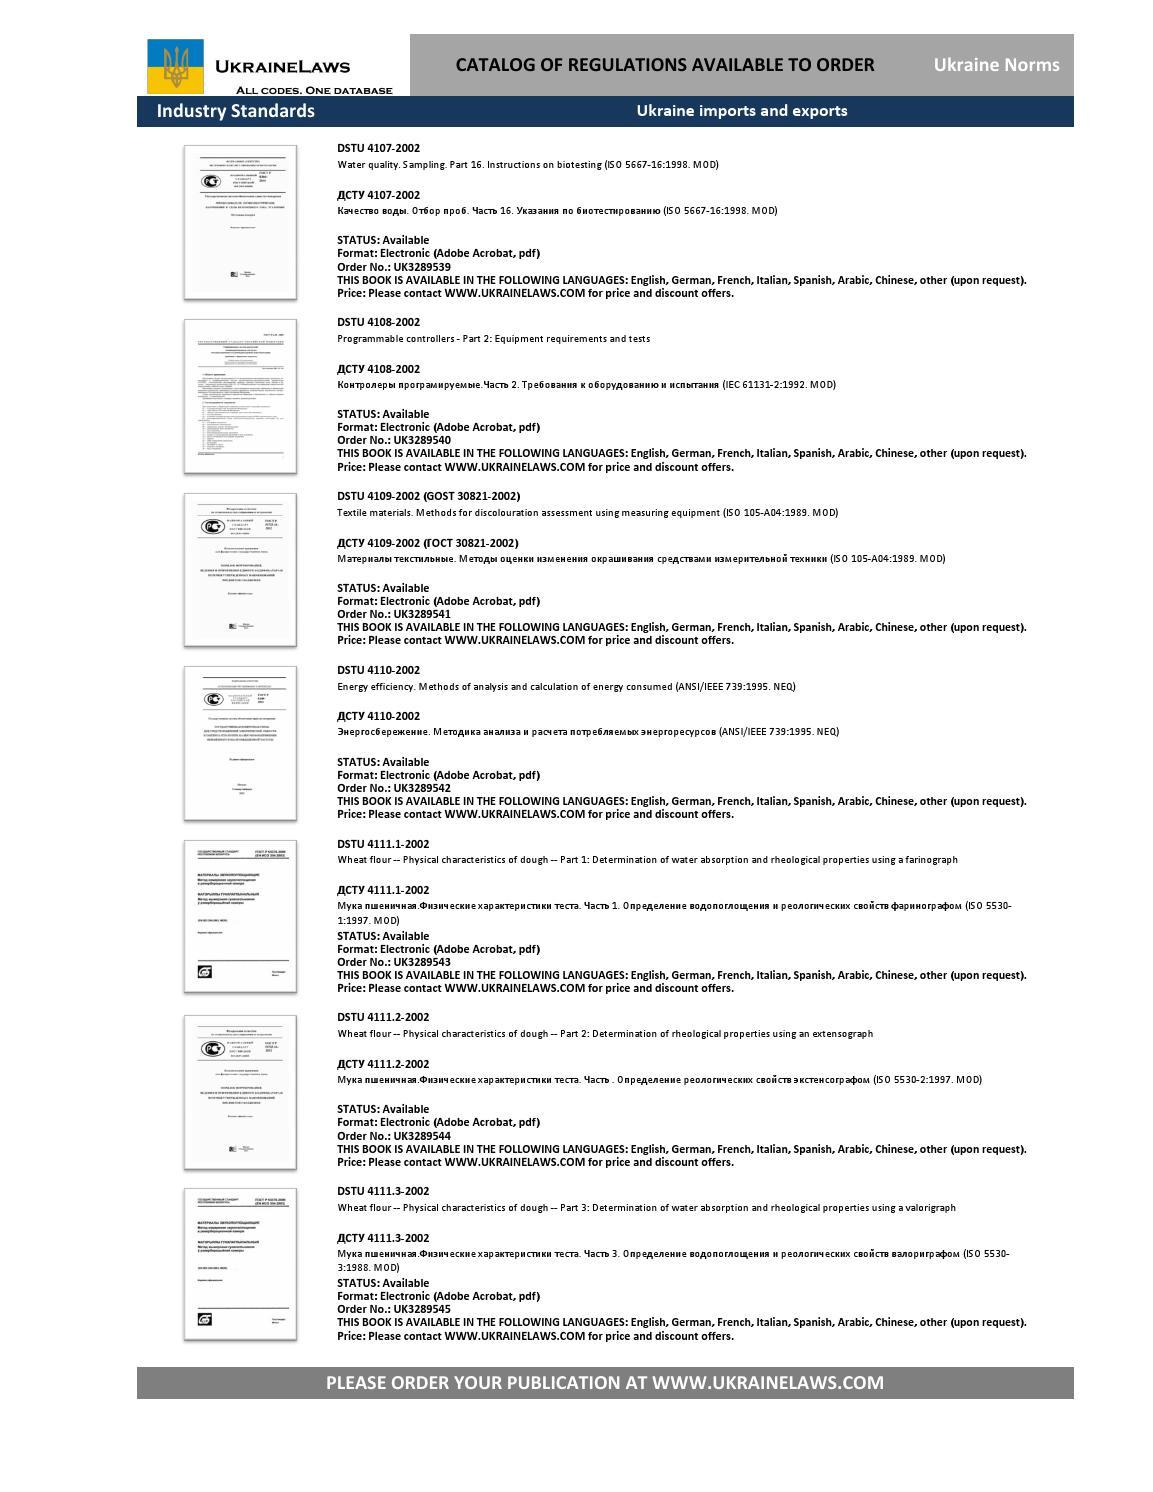 Ukrainian drug manufacturers regulations (2) by Michael4535